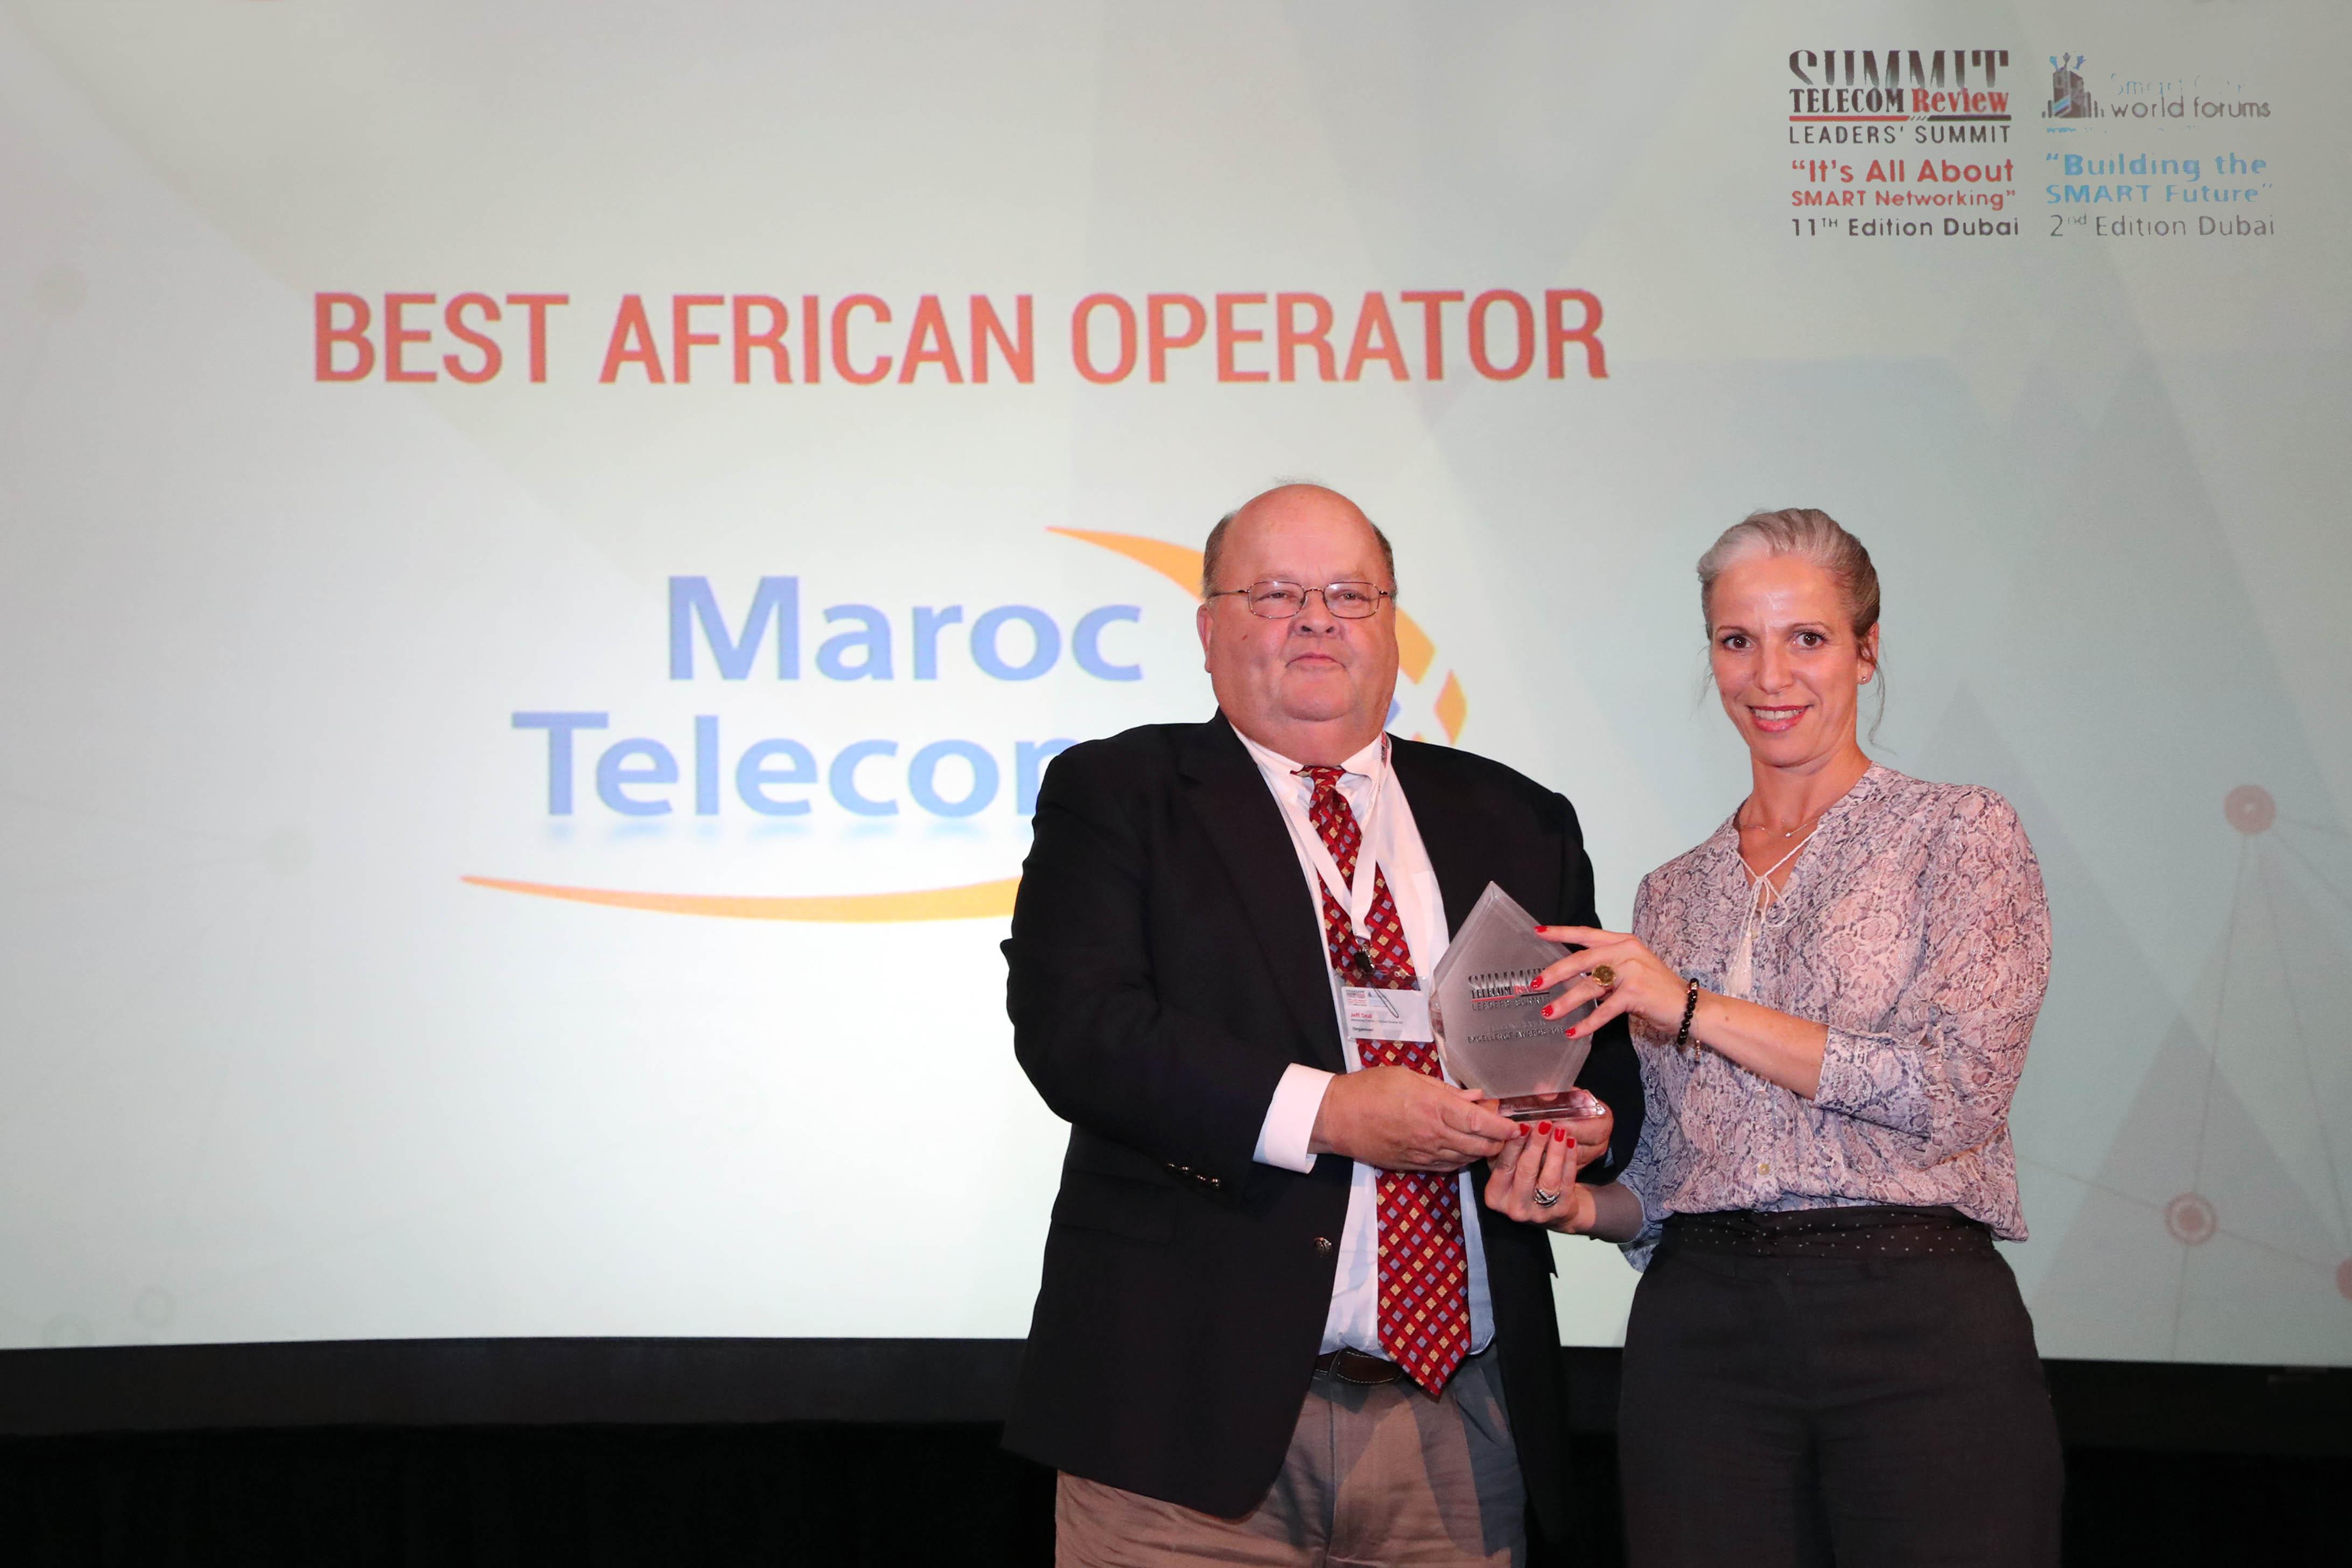 Maroc Telecom primé «Meilleur opérateur africain»